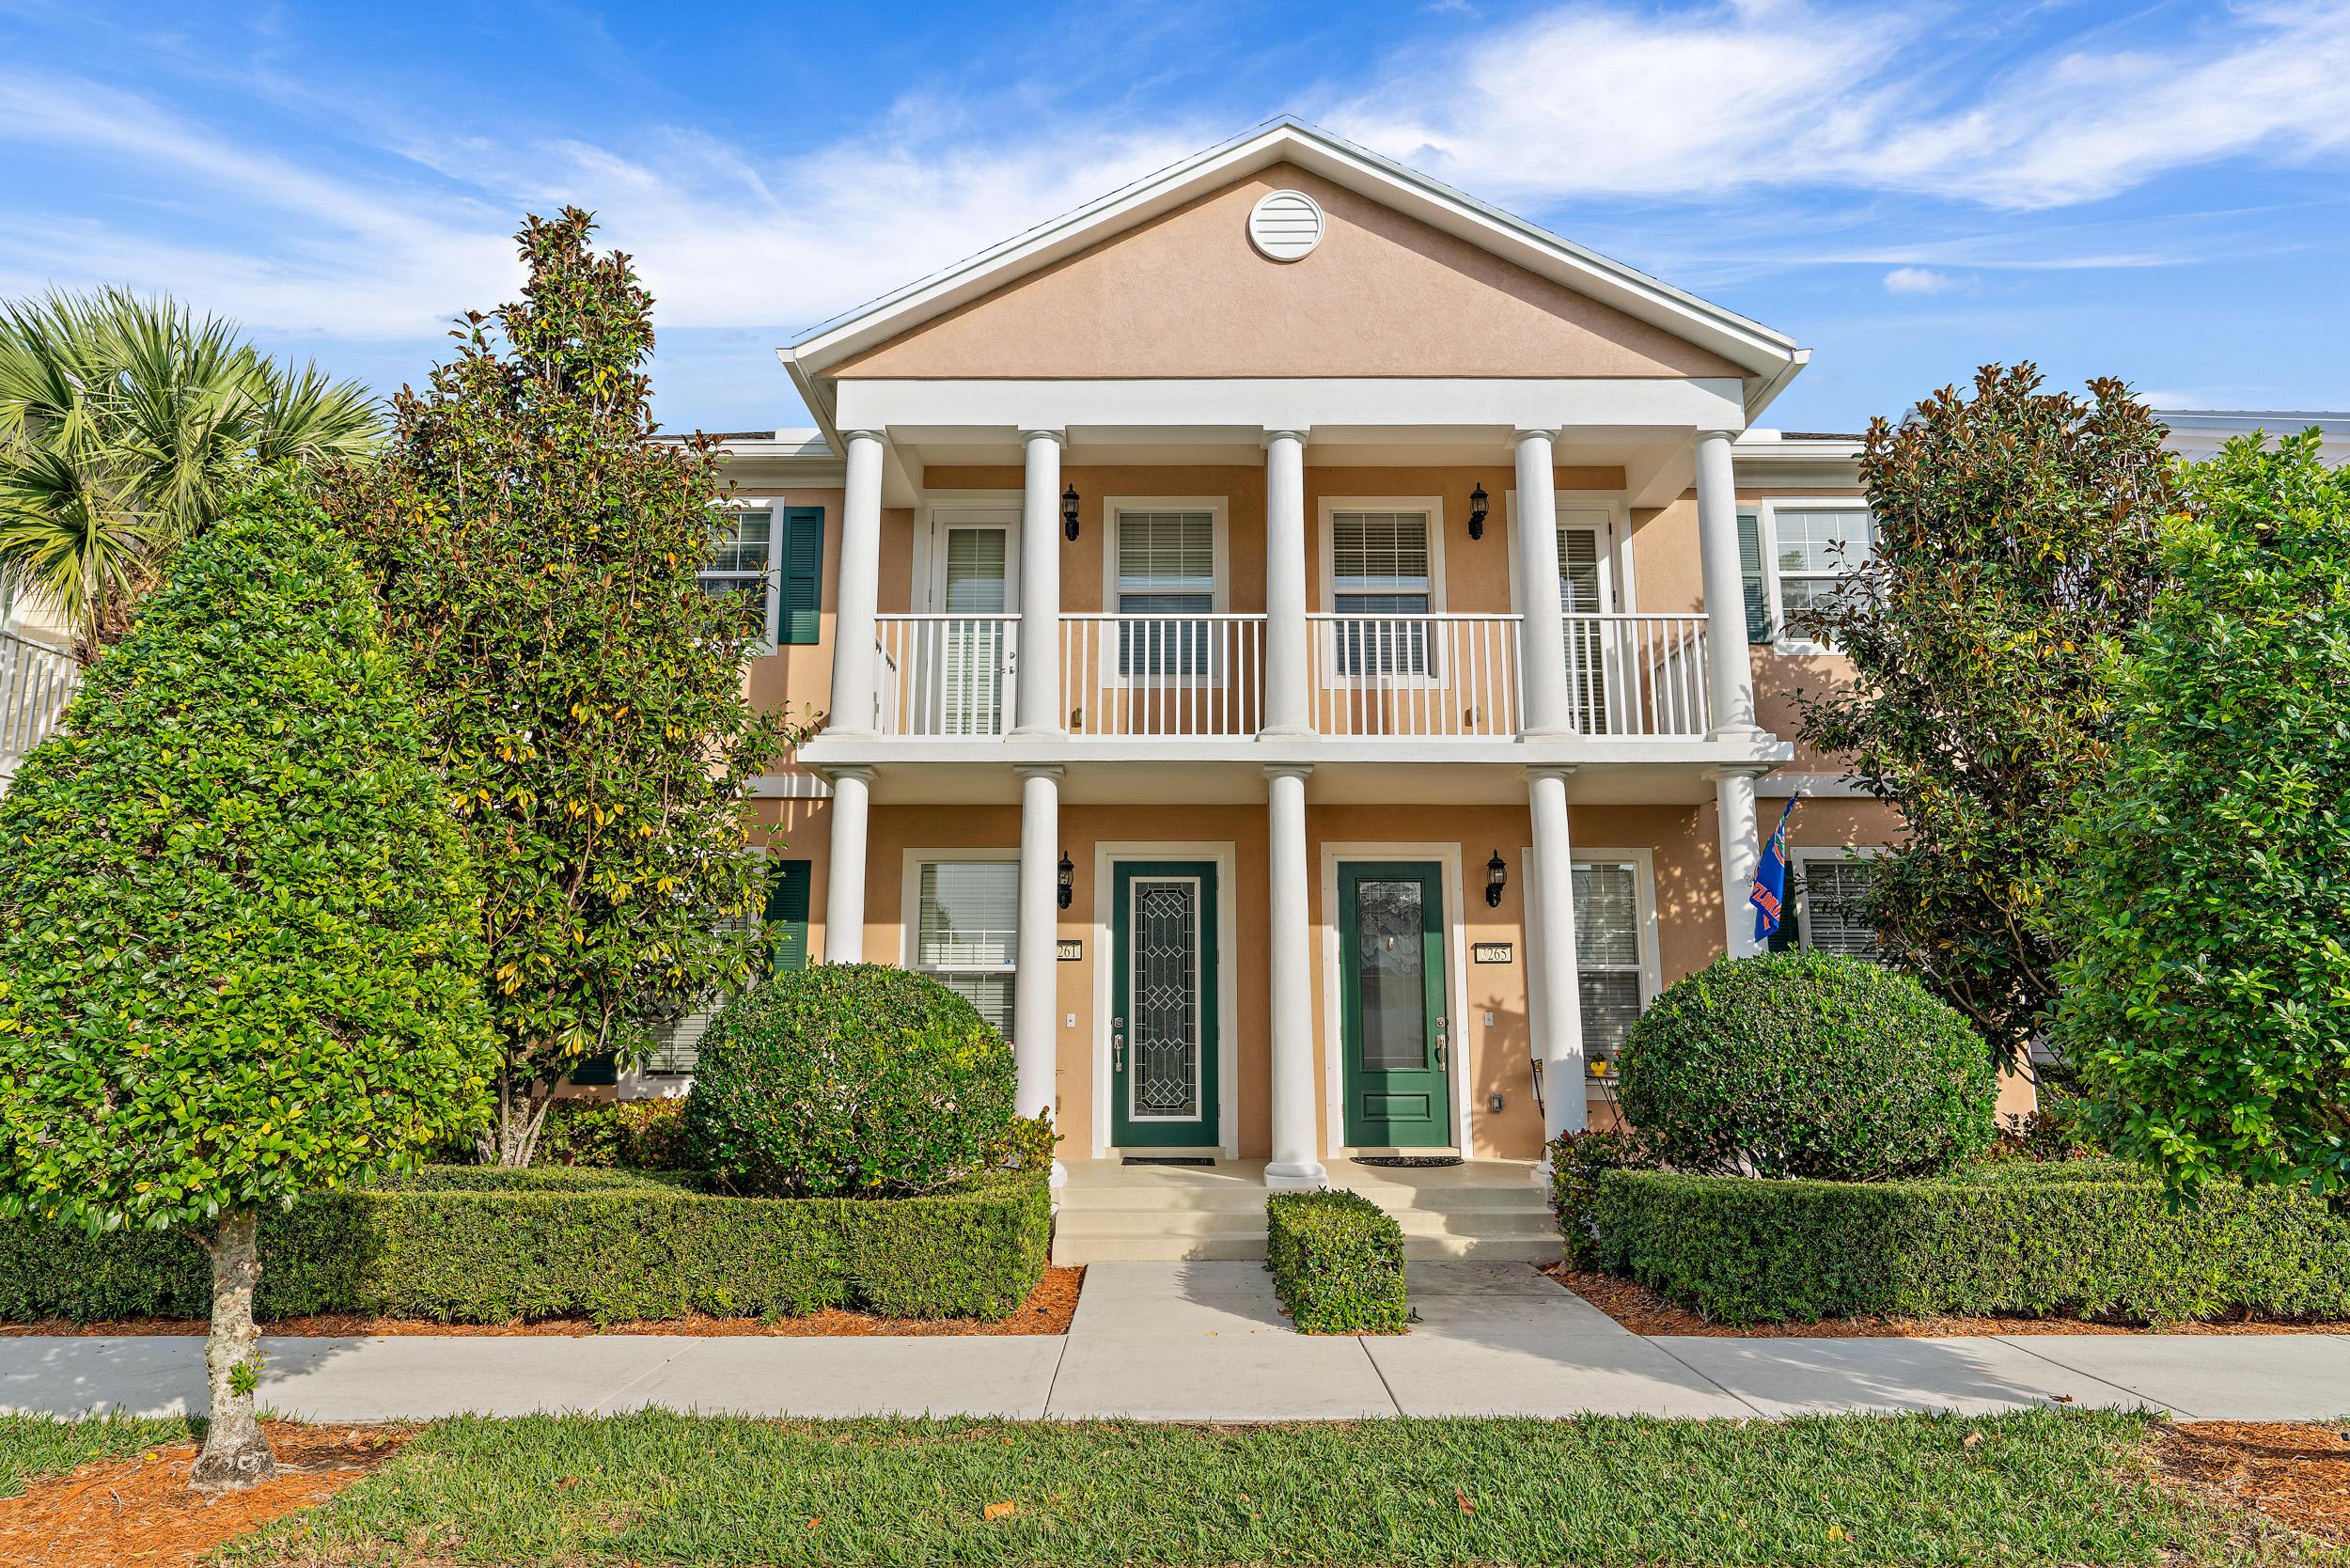 3261 Duncombe Drive, Jupiter, Florida 33458, 3 Bedrooms Bedrooms, ,2.1 BathroomsBathrooms,F,Townhouse,Duncombe,RX-10528115